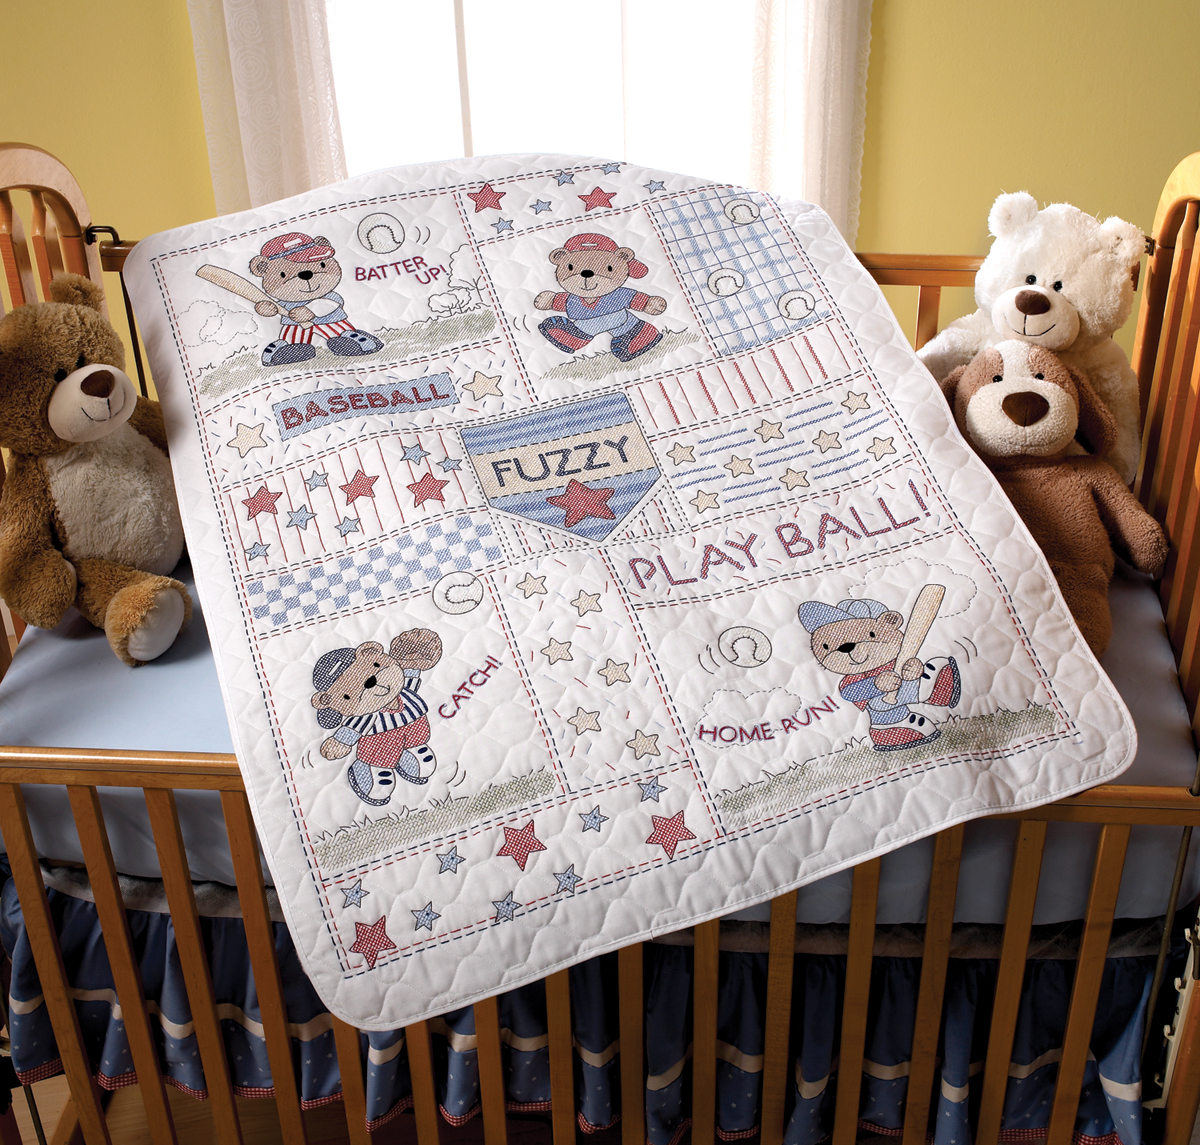 "Bucilla Baseball Buddies Crib Cover Stamped Cross Stitch Kit, 34"" x 43"""